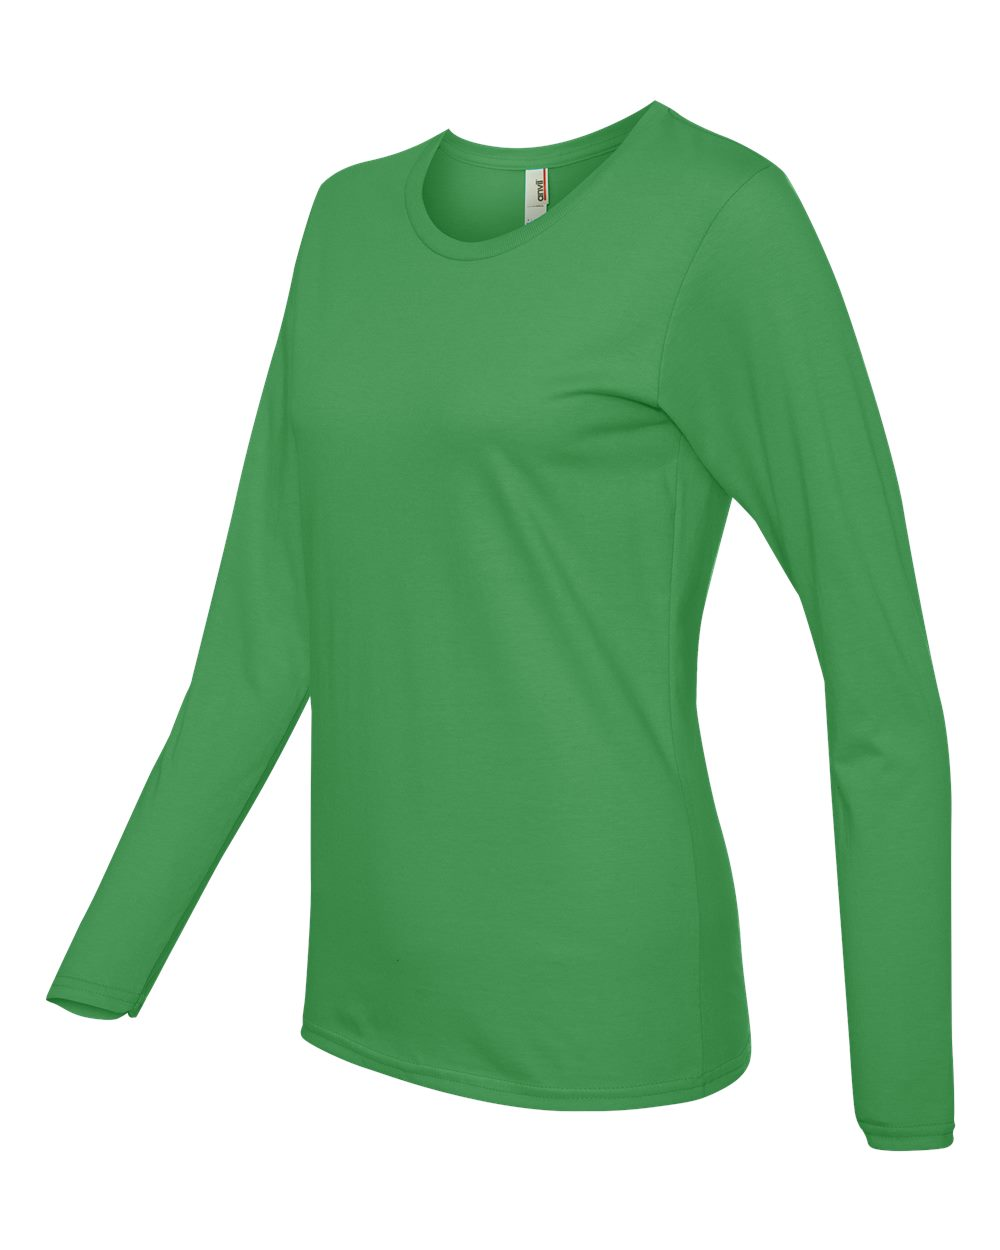 Anvil-Womens-Lightweight-Long-Sleeve-T-Shirt-884L-Size-S-2XL thumbnail 10